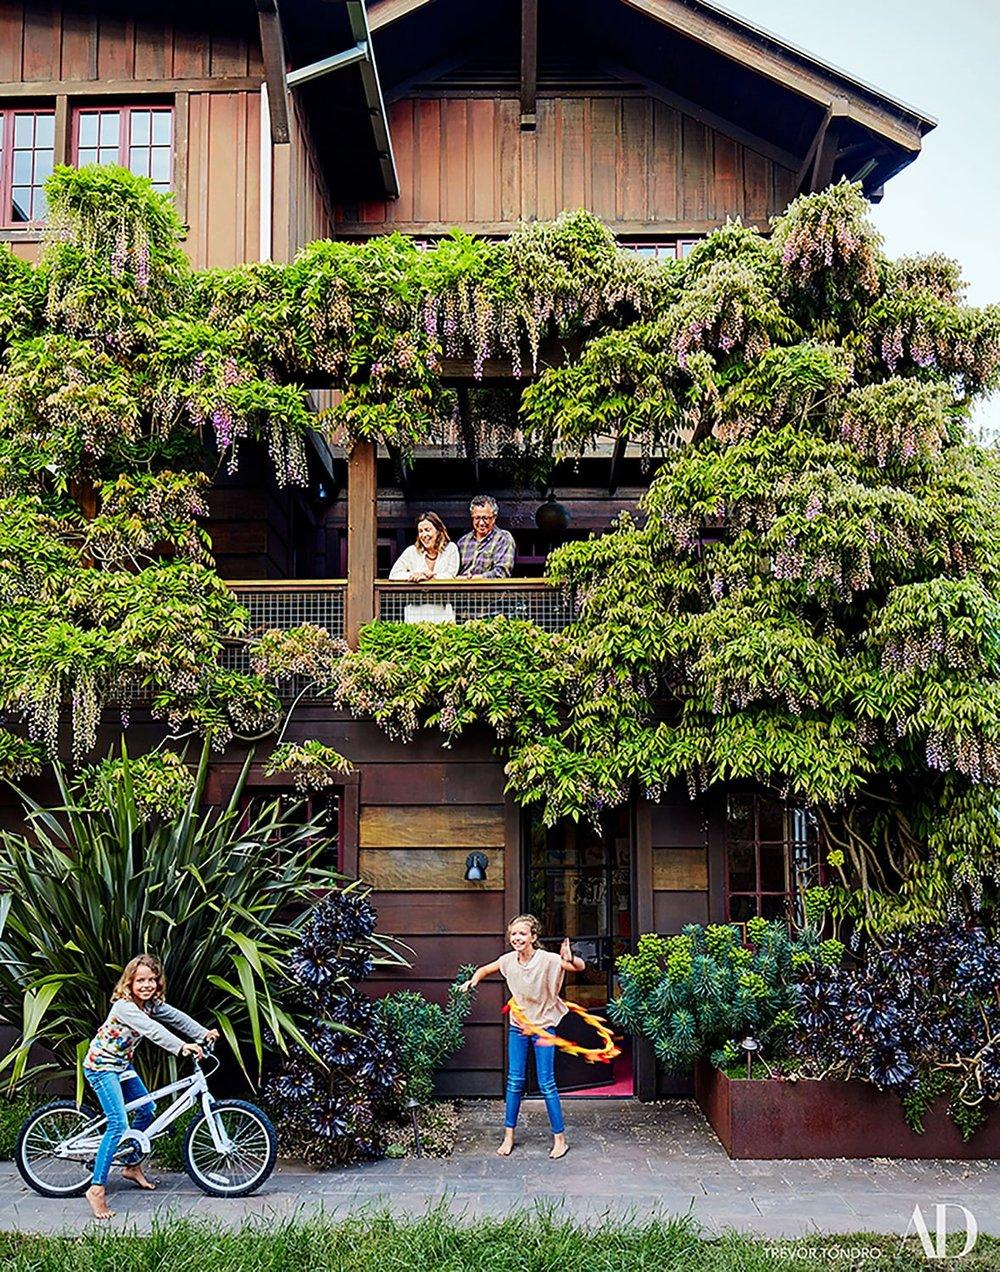 Berkeley-CA-Hills-House-Exterior-Garden-Studio-Geiger-Sustainable-Architecture.jpg